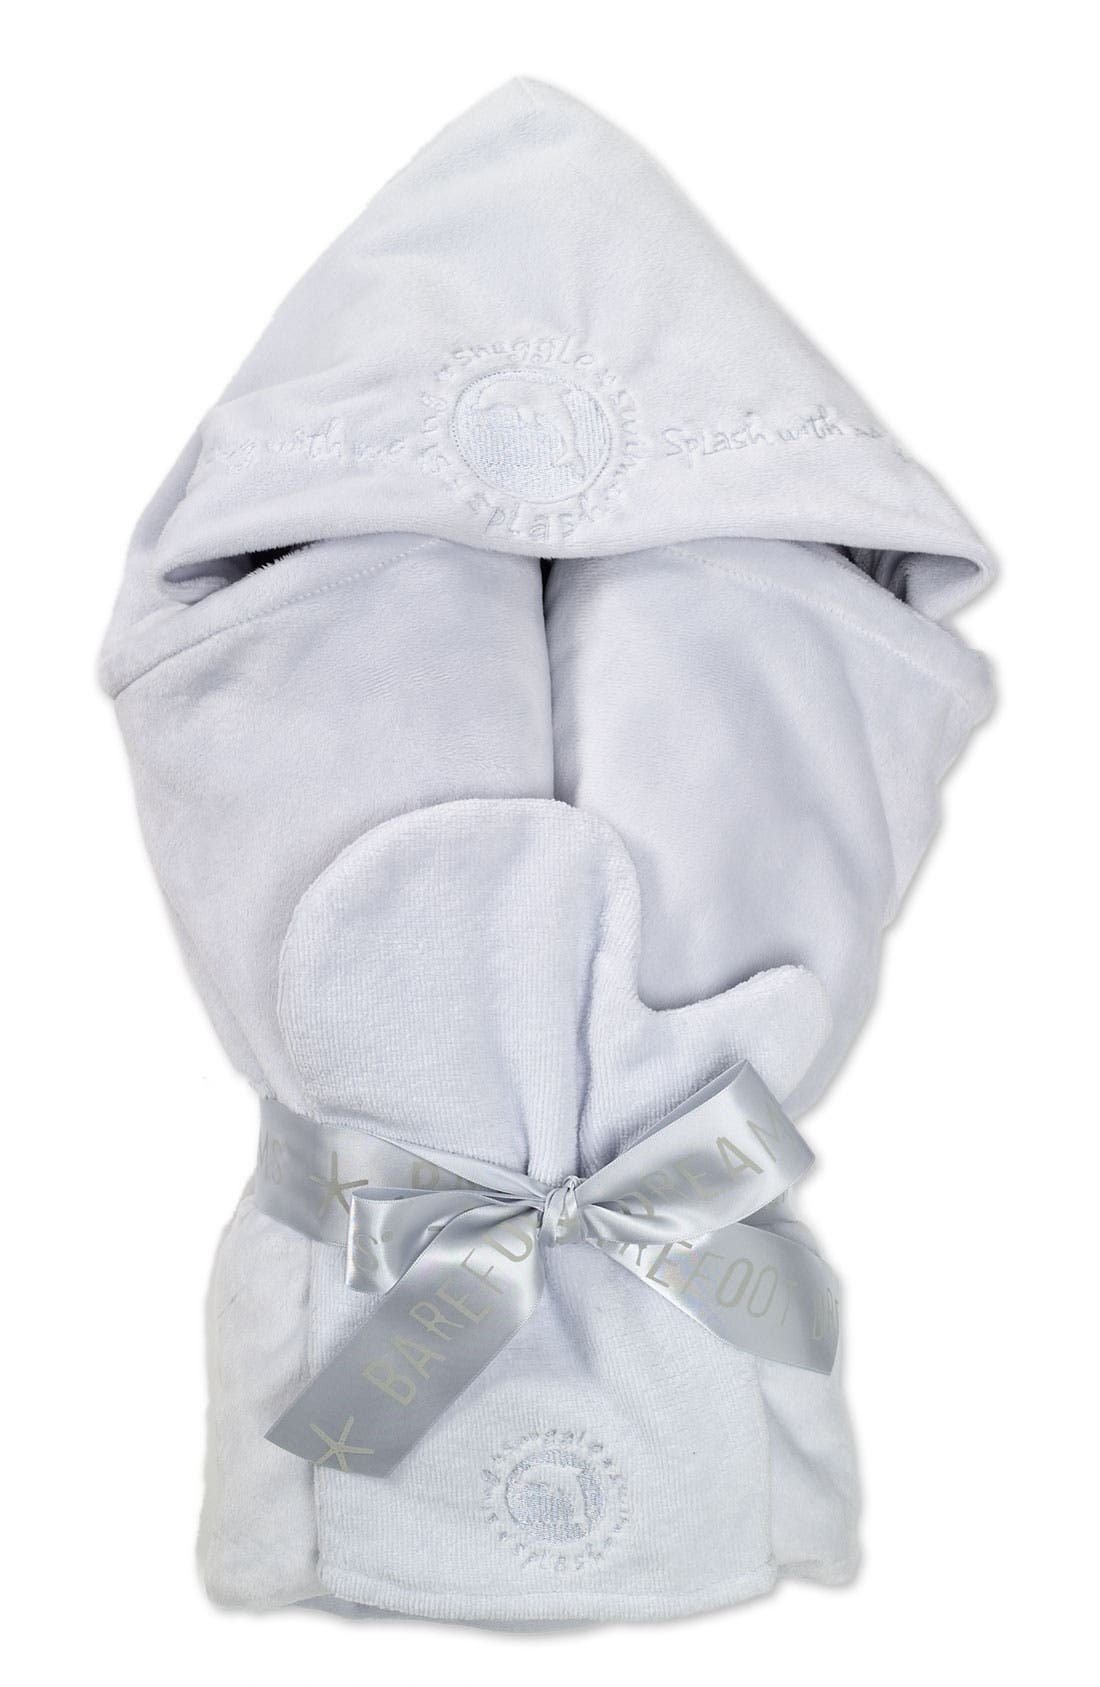 Alternate Image 1 Selected - Barefoot Dreams® Hooded Towel Set